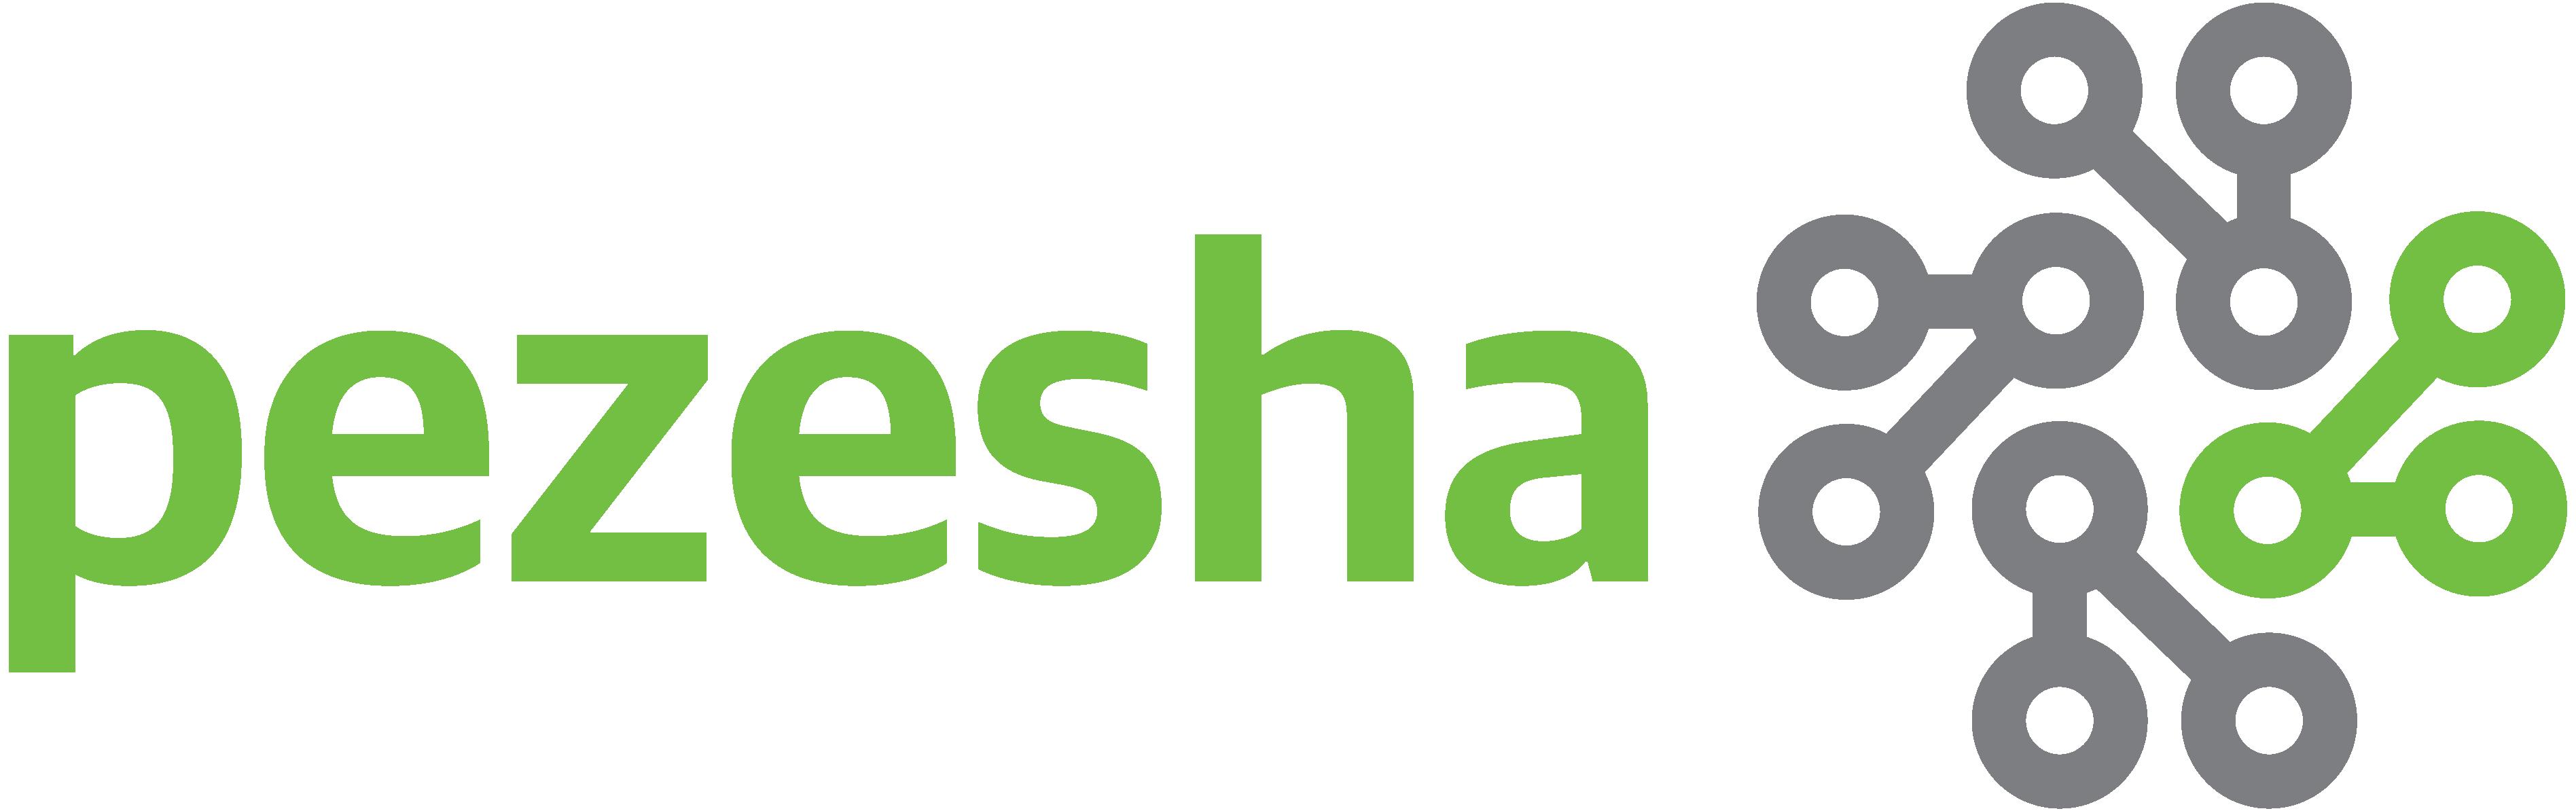 Pezesha